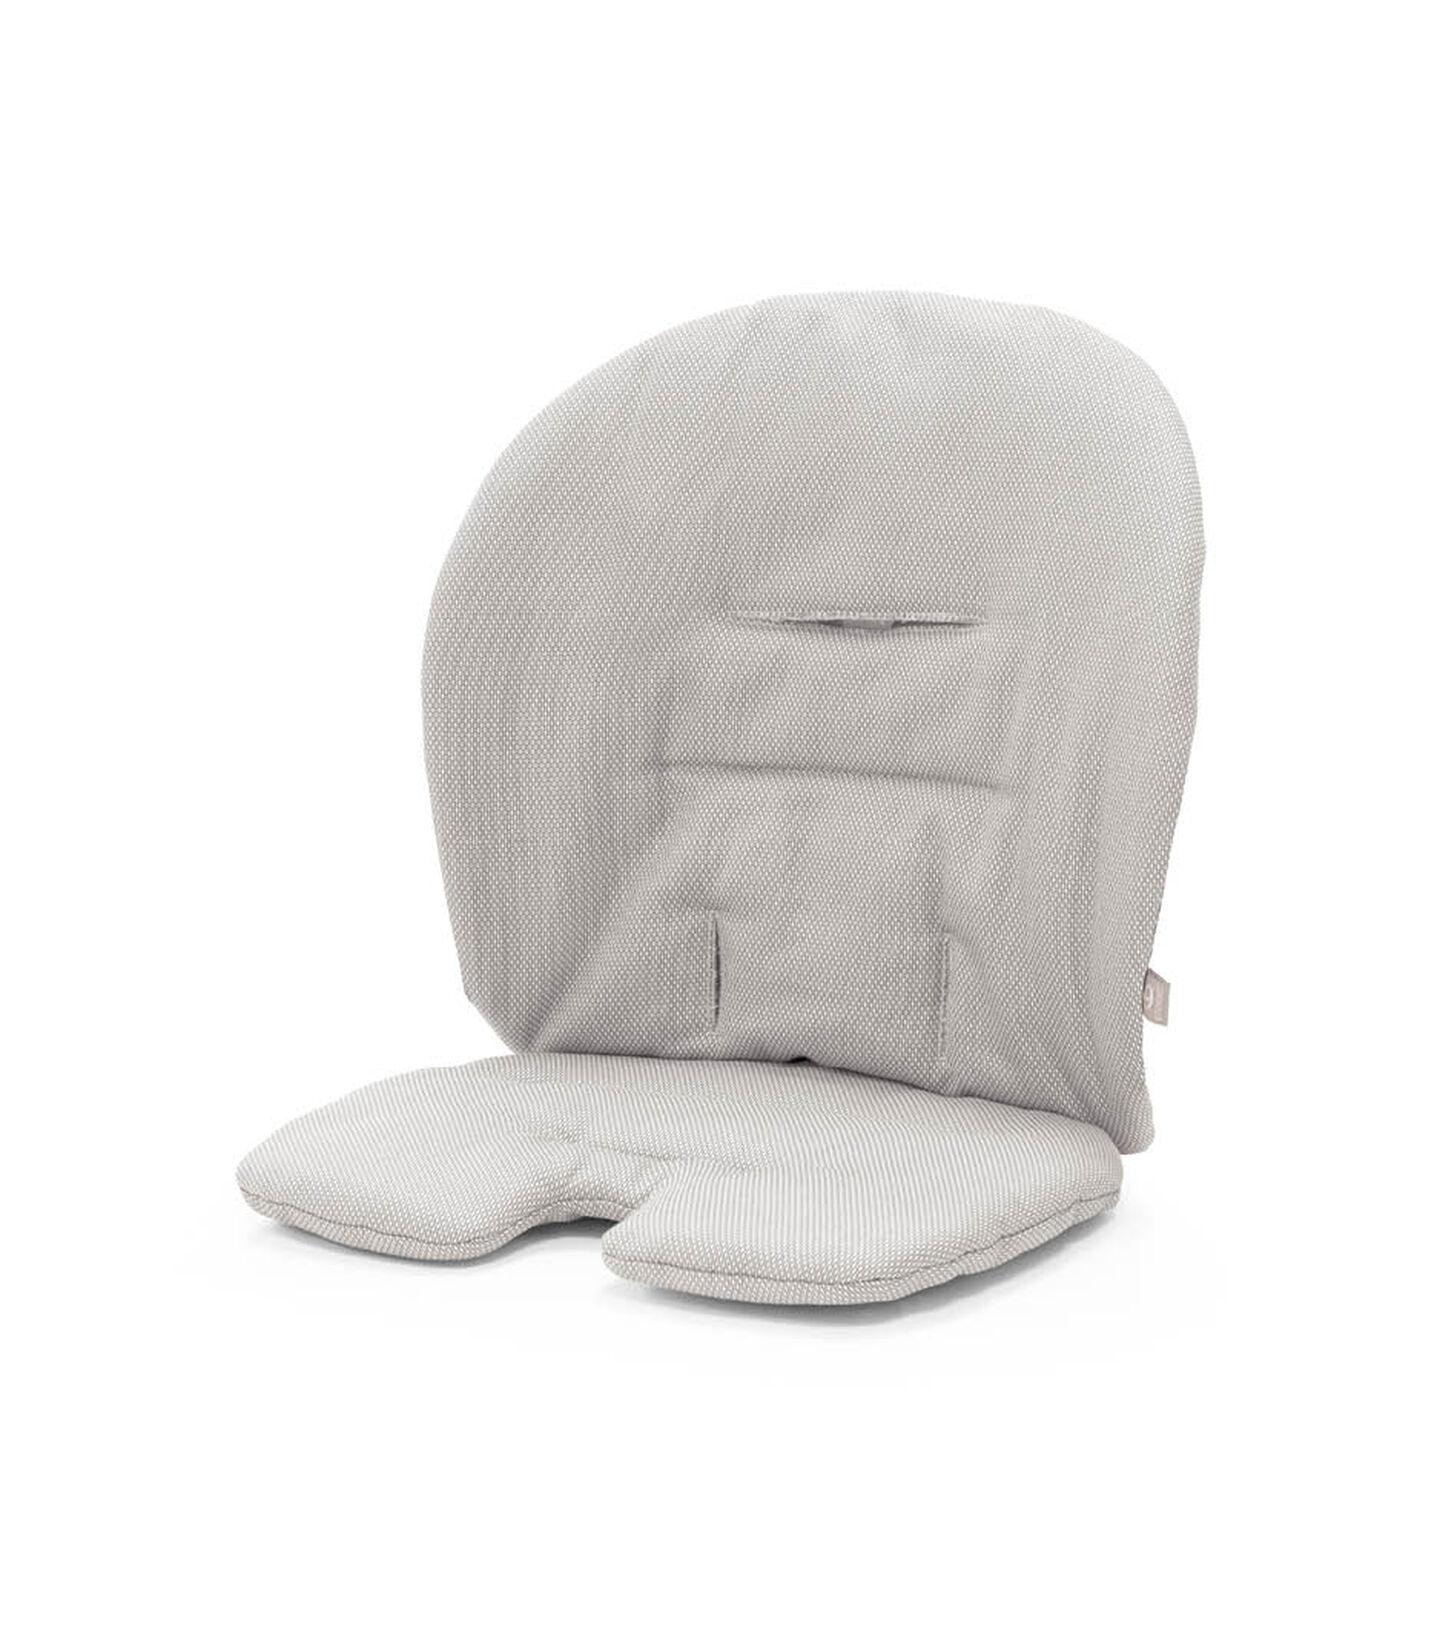 Stokke® Steps™ Baby Set Cushion Timeless Grey, Timeless Grey, mainview